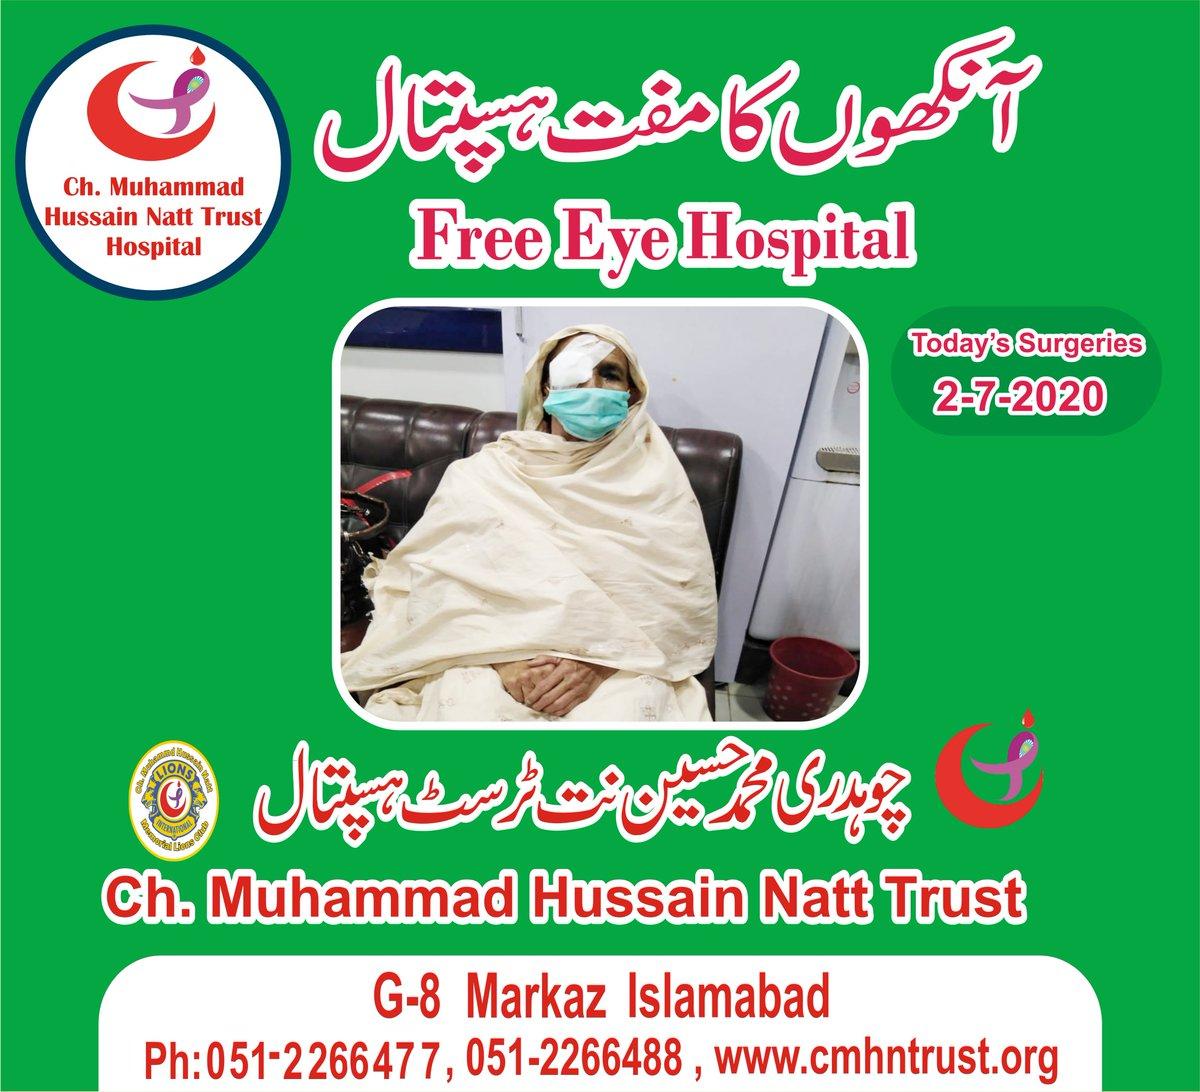 #hospital #Covid_19 #StayHome #Corona #Pakistan #Cataract #donation #eyes #ngo #Forbes #BreakingNews #Madinah #Makkah #Lahore #Karachi #dubai #العدالة_للطفل_السوري https://t.co/RcWEM3b2qt